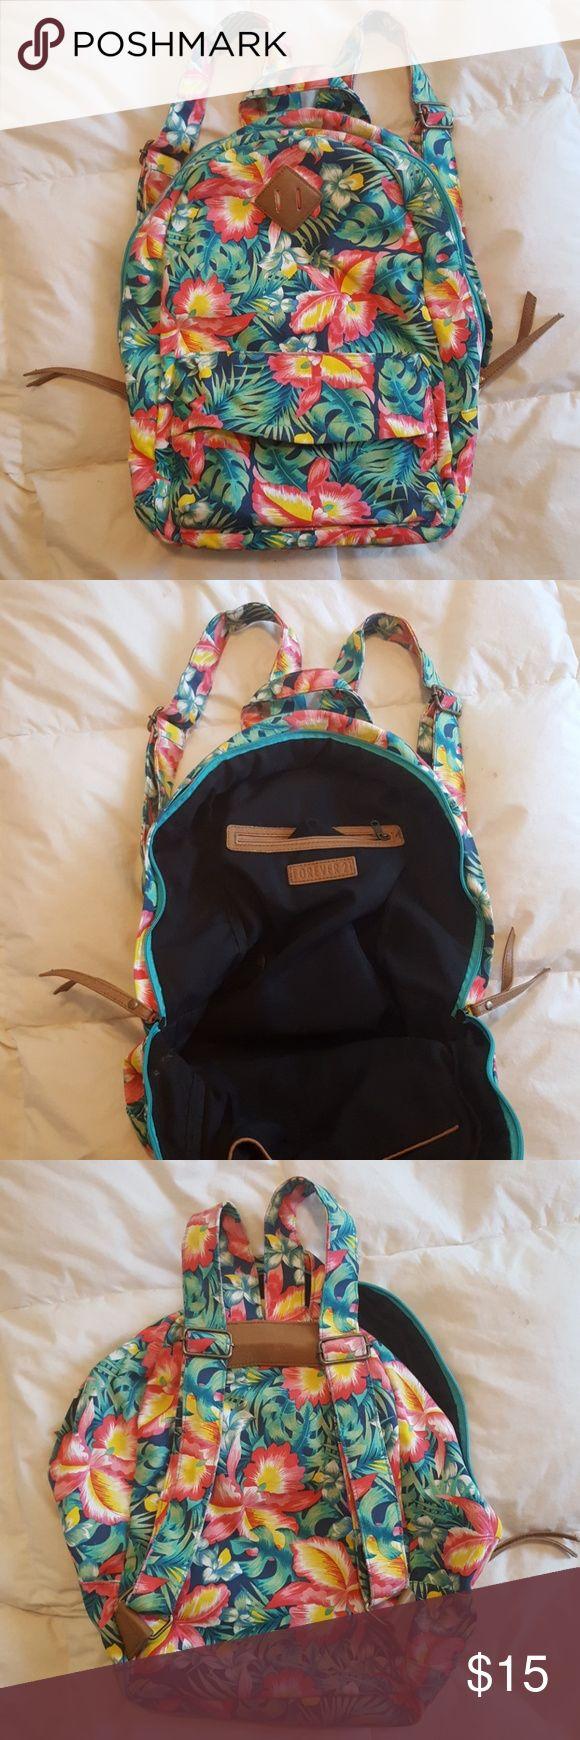 25 best ideas about kipling backpack on pinterest school handbags - Nwot Hawaiian Floral Backpack